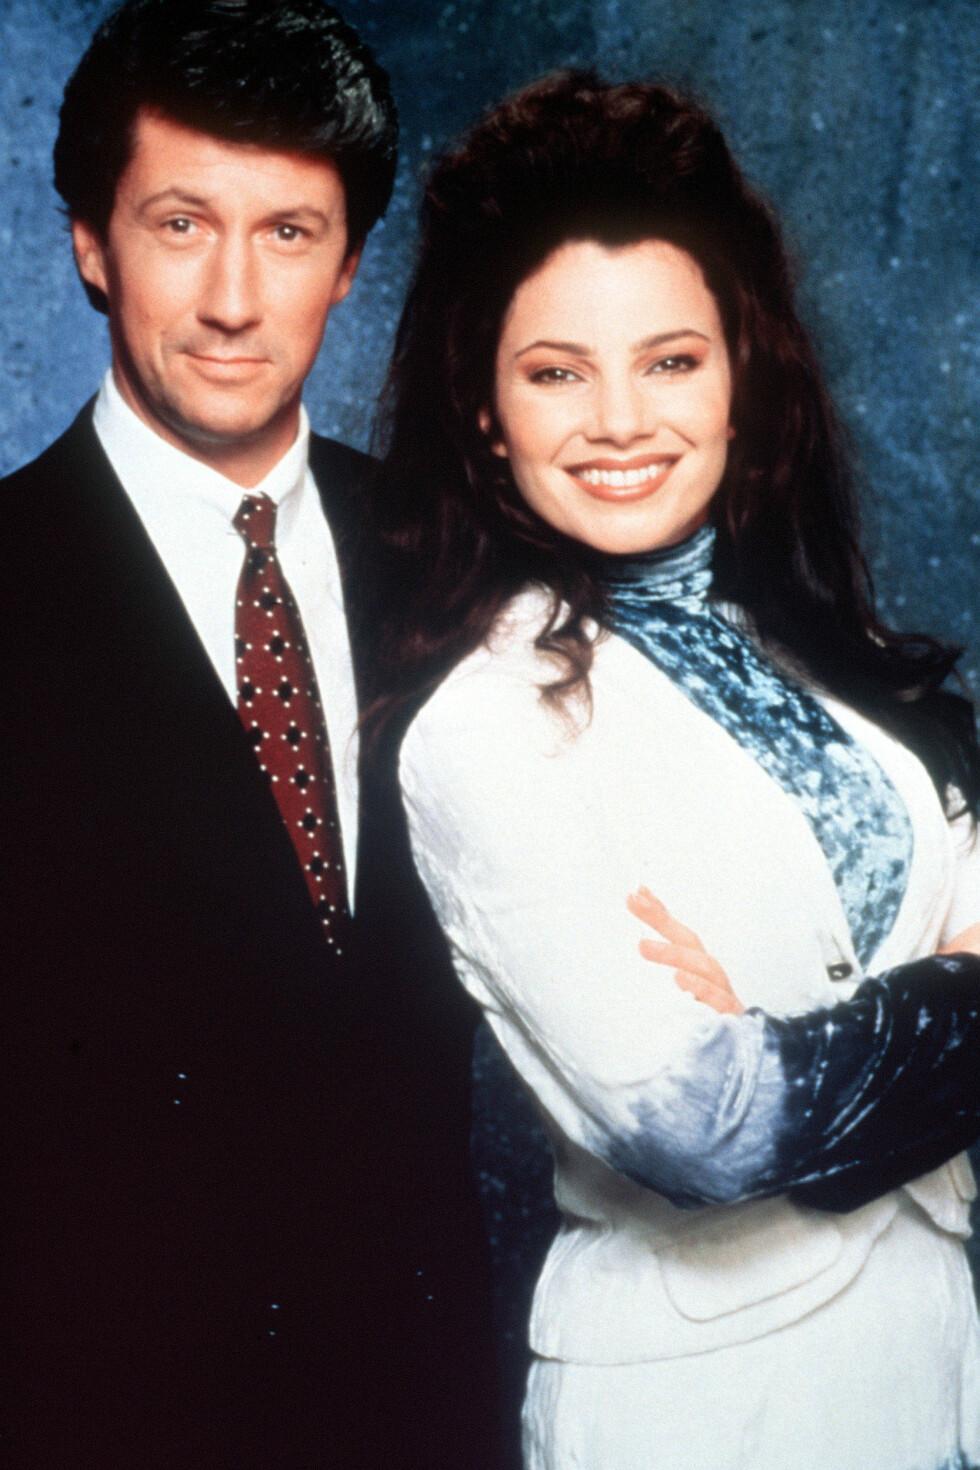 FORELSKET PÅ TV: Charles Shaughnessy og Fran Drescher spilte henholdsvis Maxwell Sheffield og Fran Fine i den populære TV-serien fra 90-tallet. Foto: NTB Scanpix